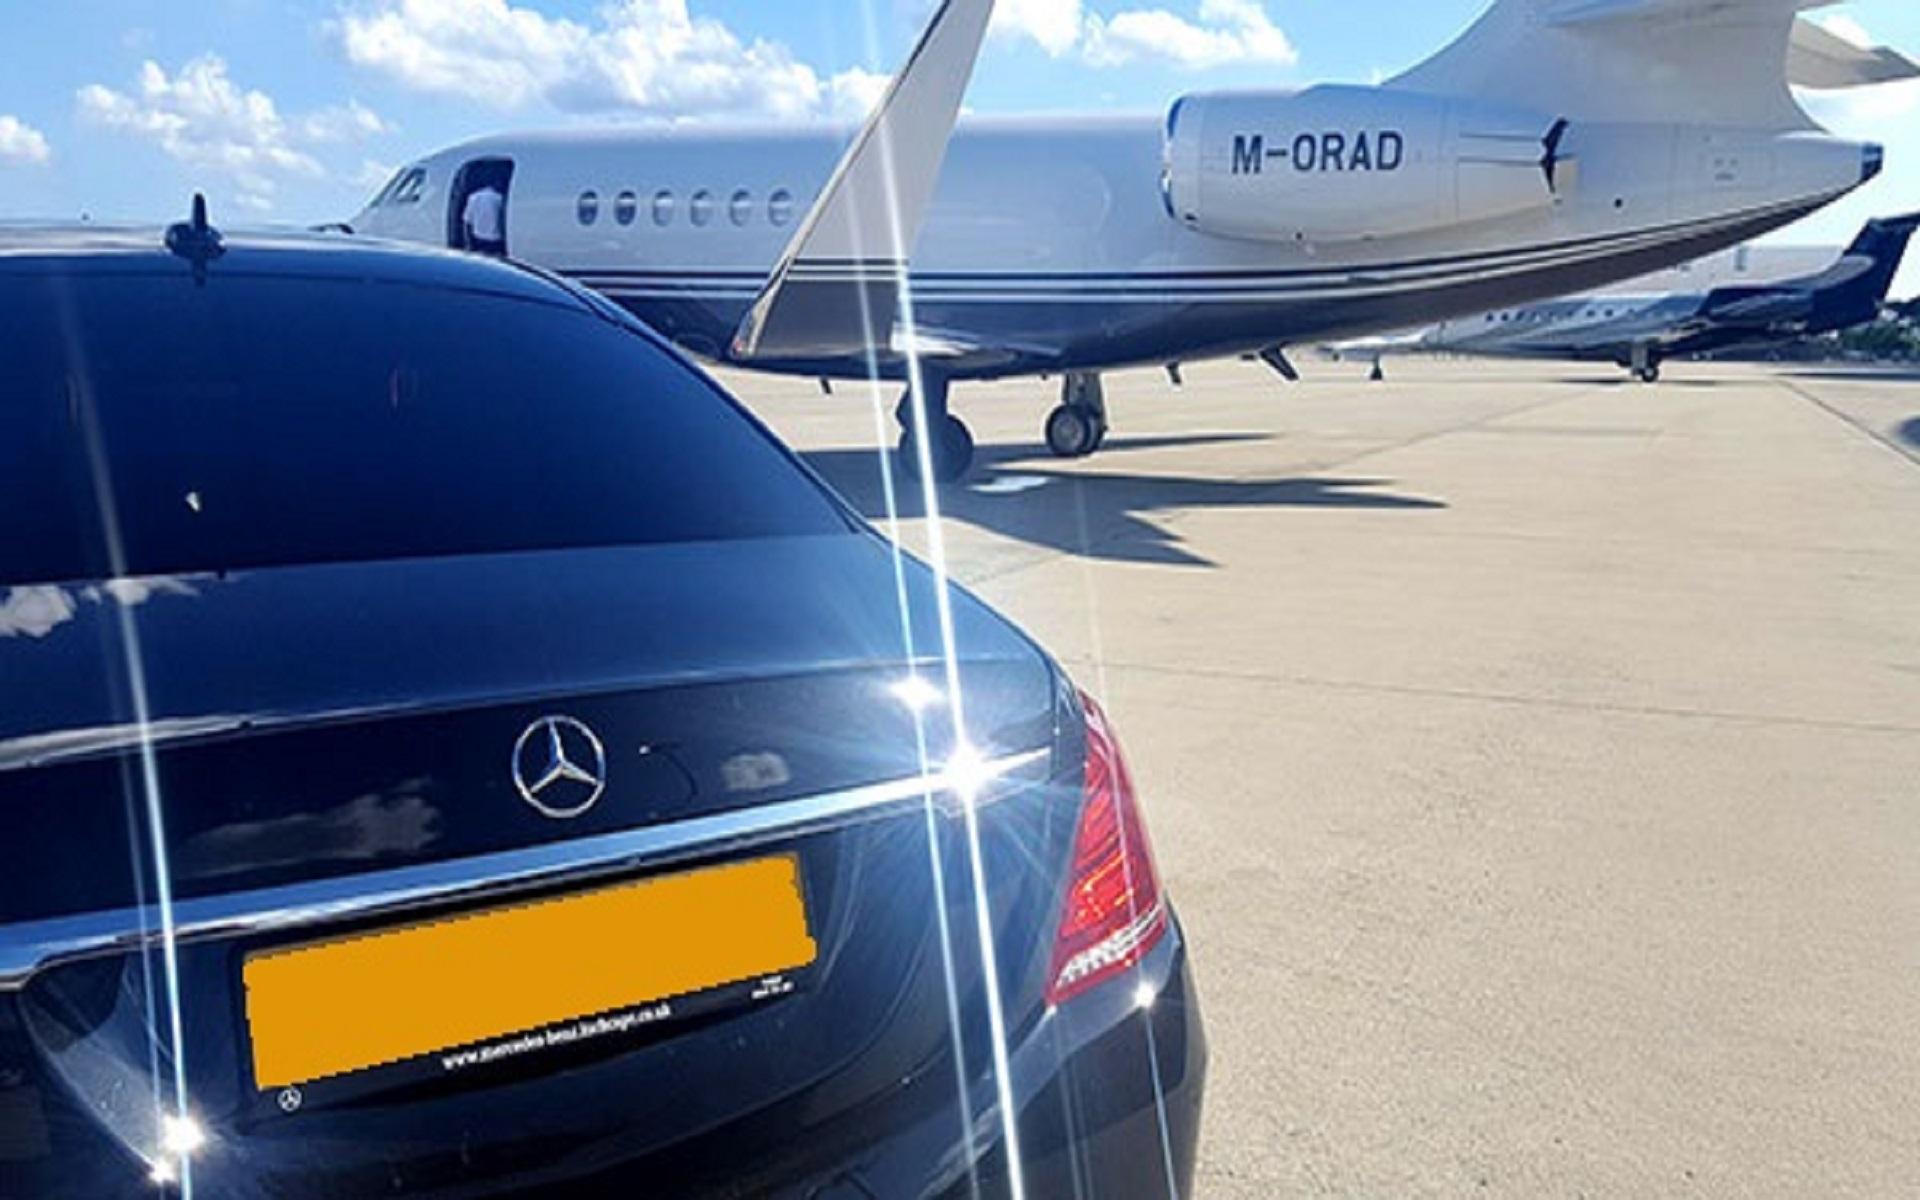 London Heathrow Airport Transfer